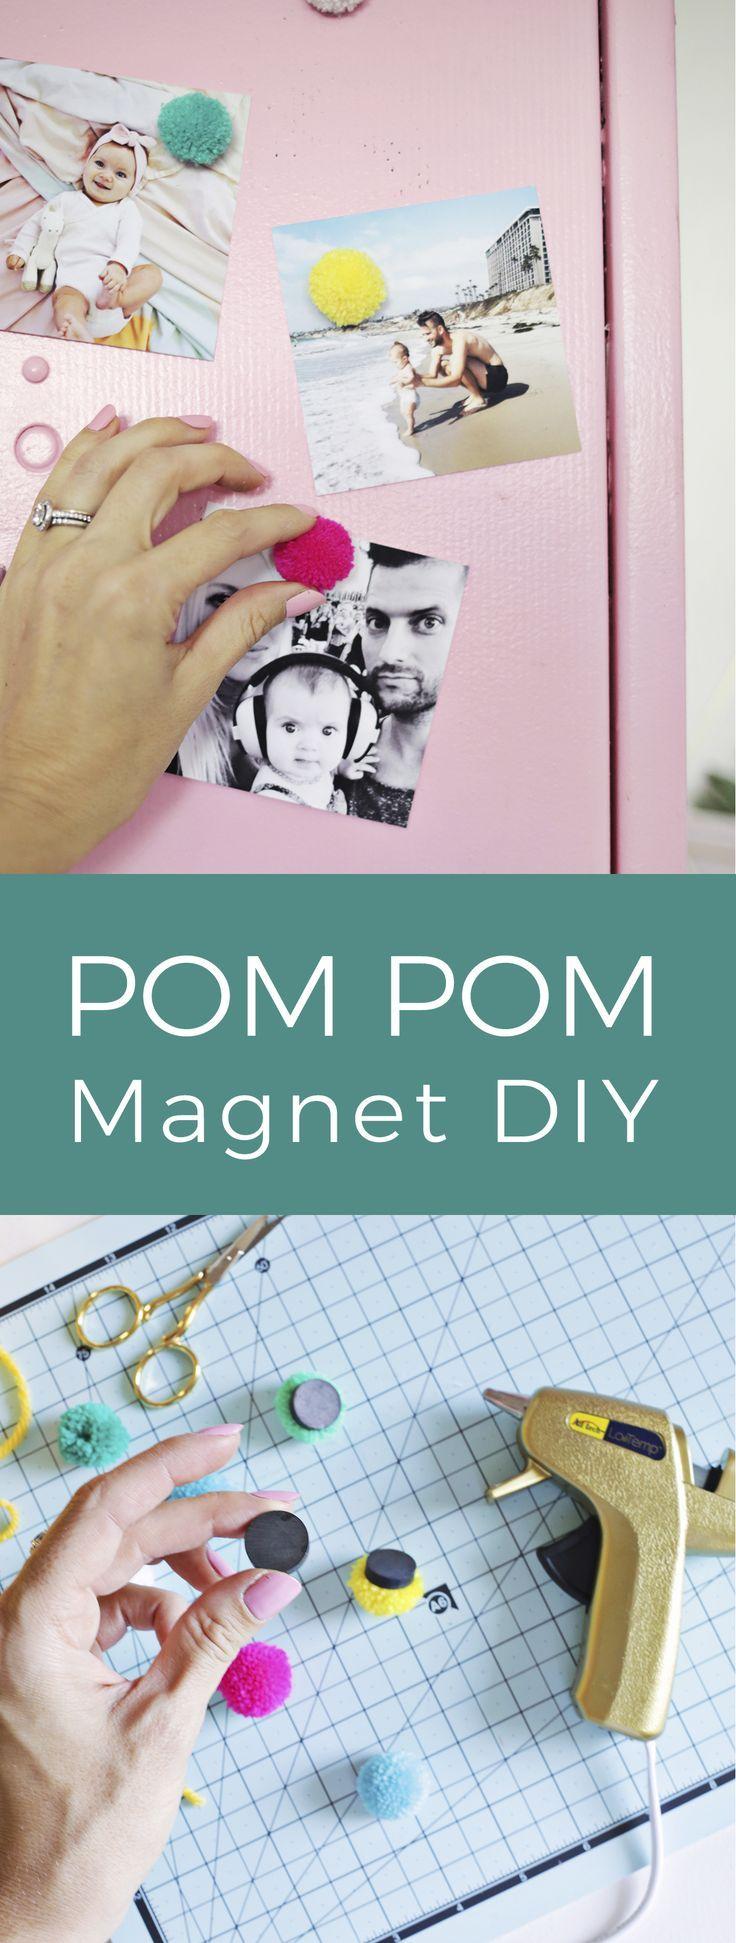 Pom Pom Magnets DIY | www.homeology.co.za  #DIY #crafts #craftprojects #photostand #photowall